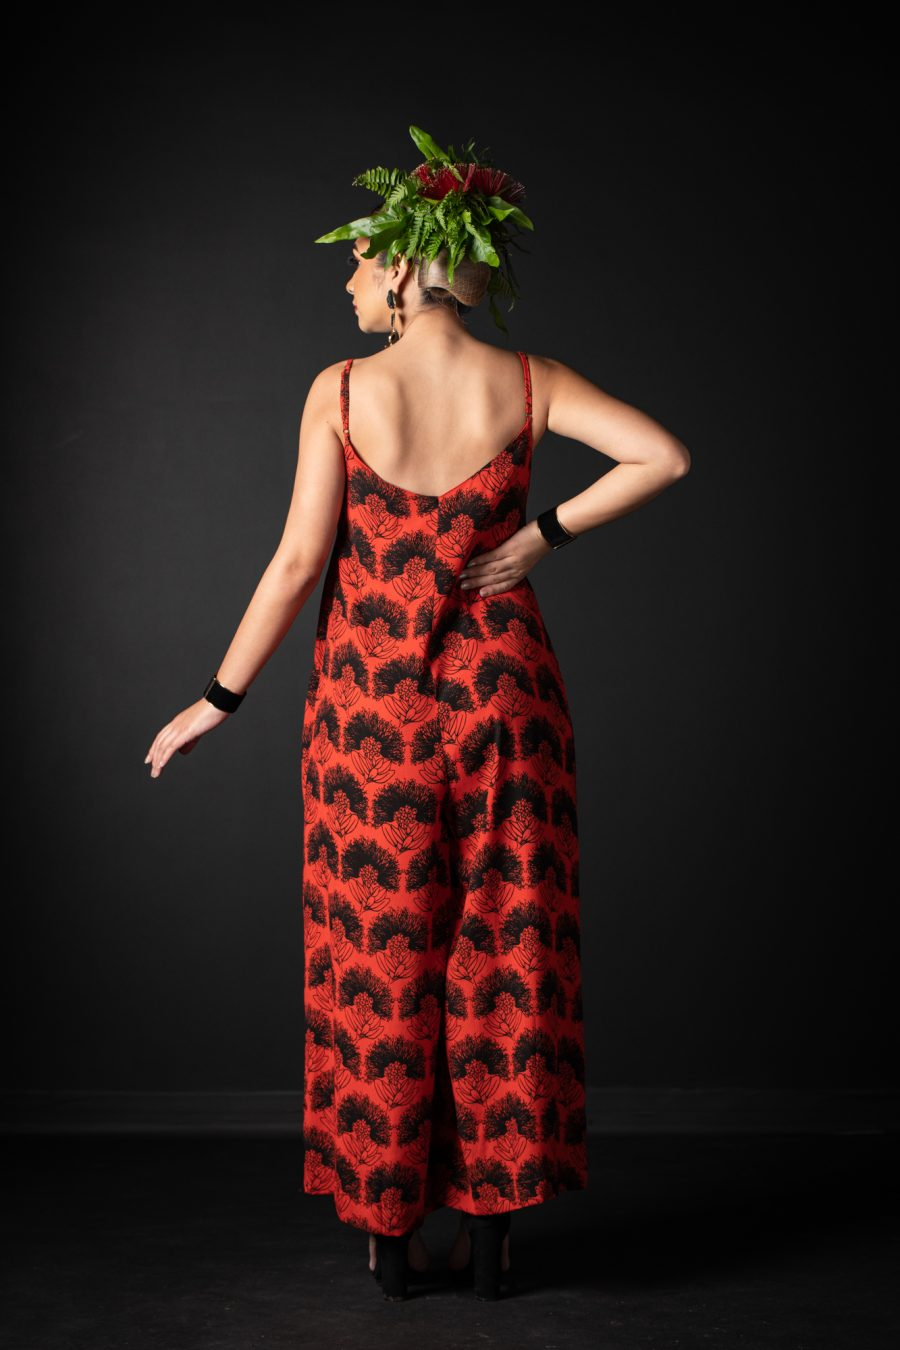 Model wearing LANIHAU JUMPSUIT in Firey Red Black Kalihilehua Pattern - Back View